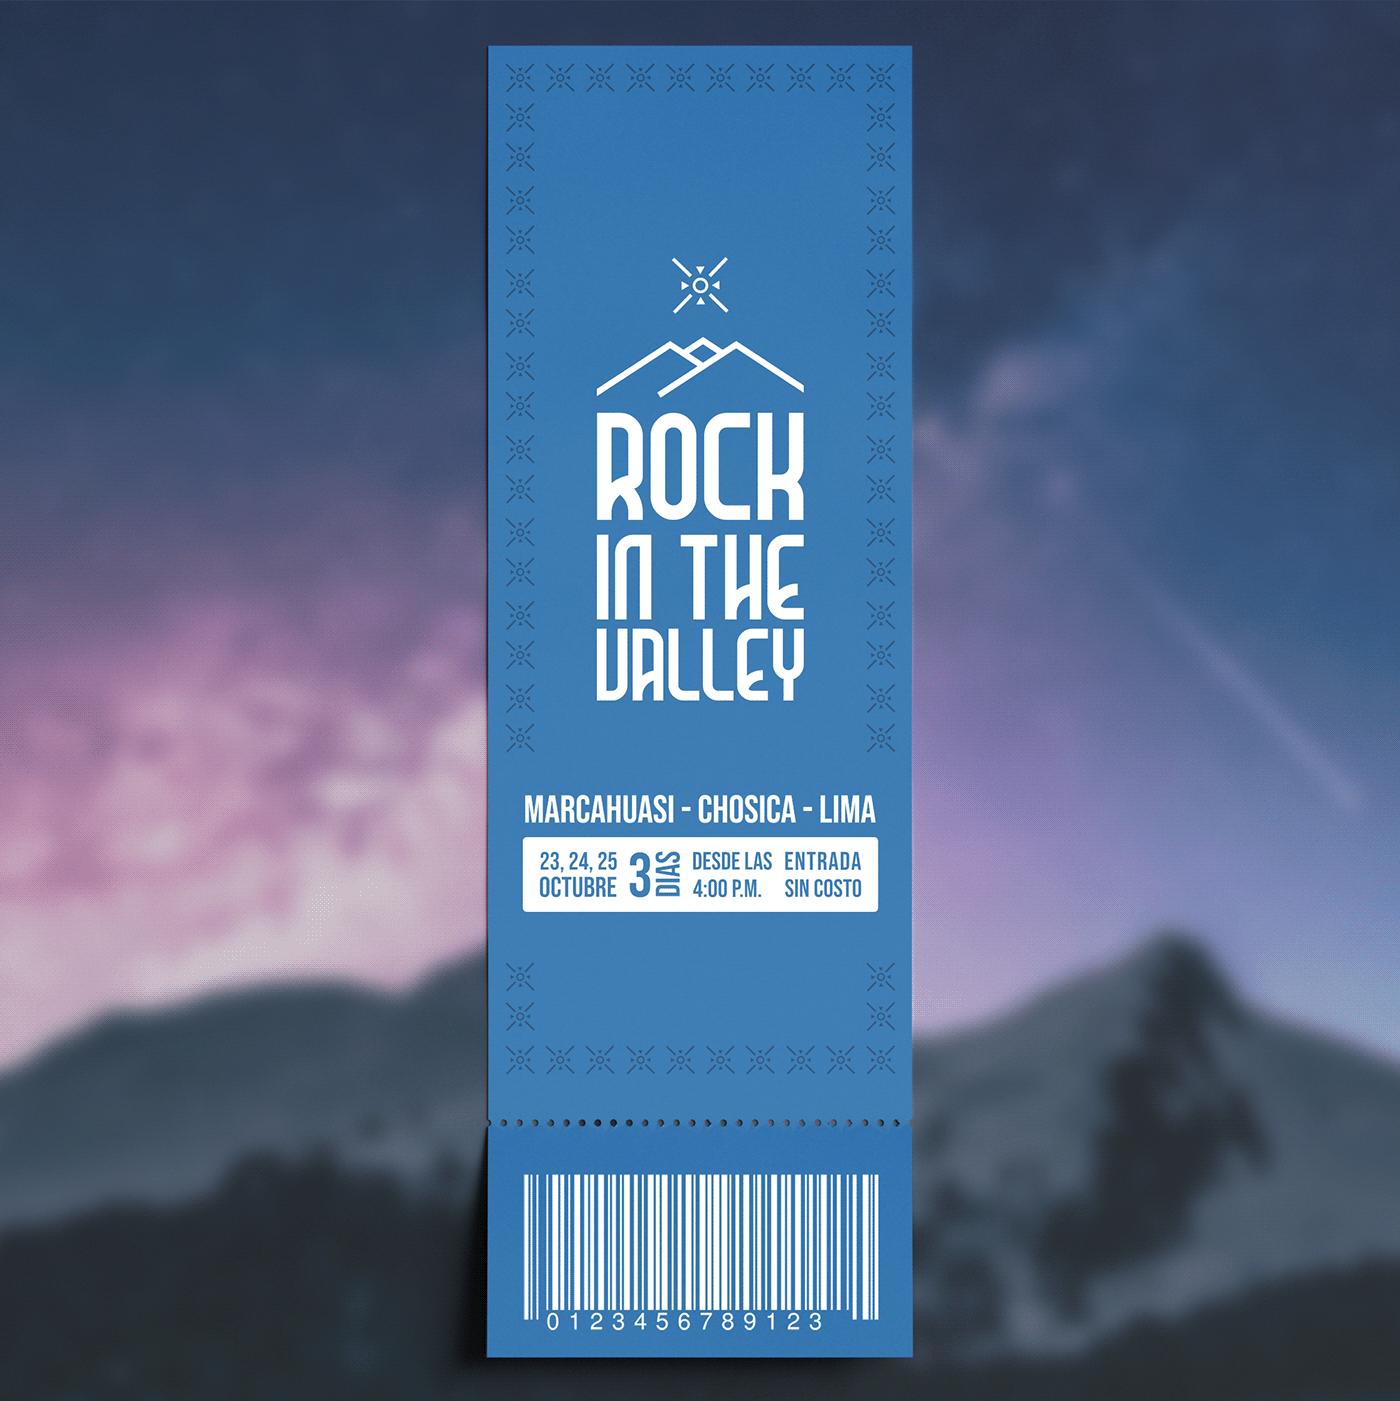 design festival logo Logotipo musica poster rock